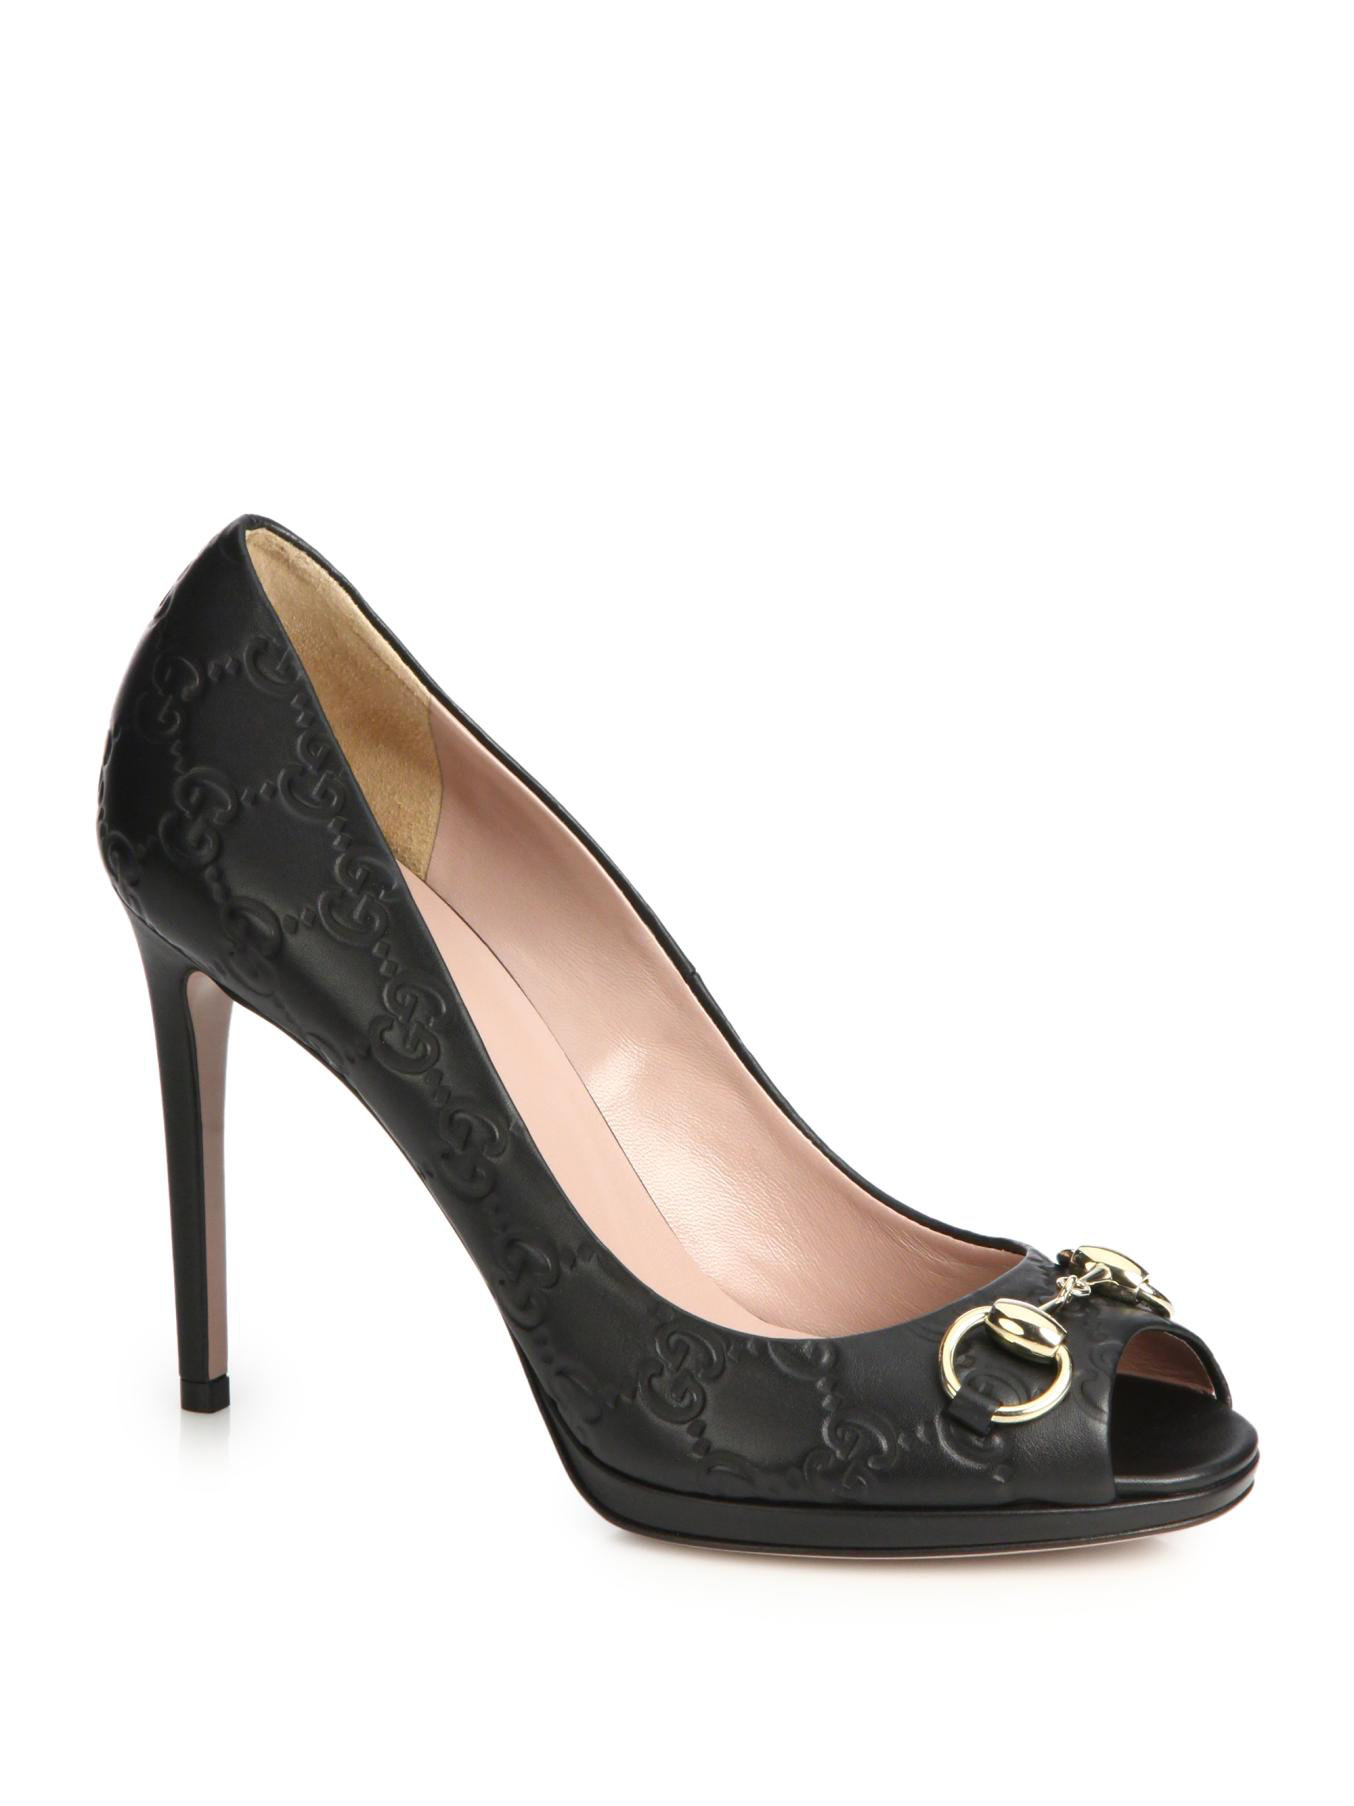 c01a89899c3a7 Gucci Black Gisele Monogram-embossed Leather Peep-toe Pumps